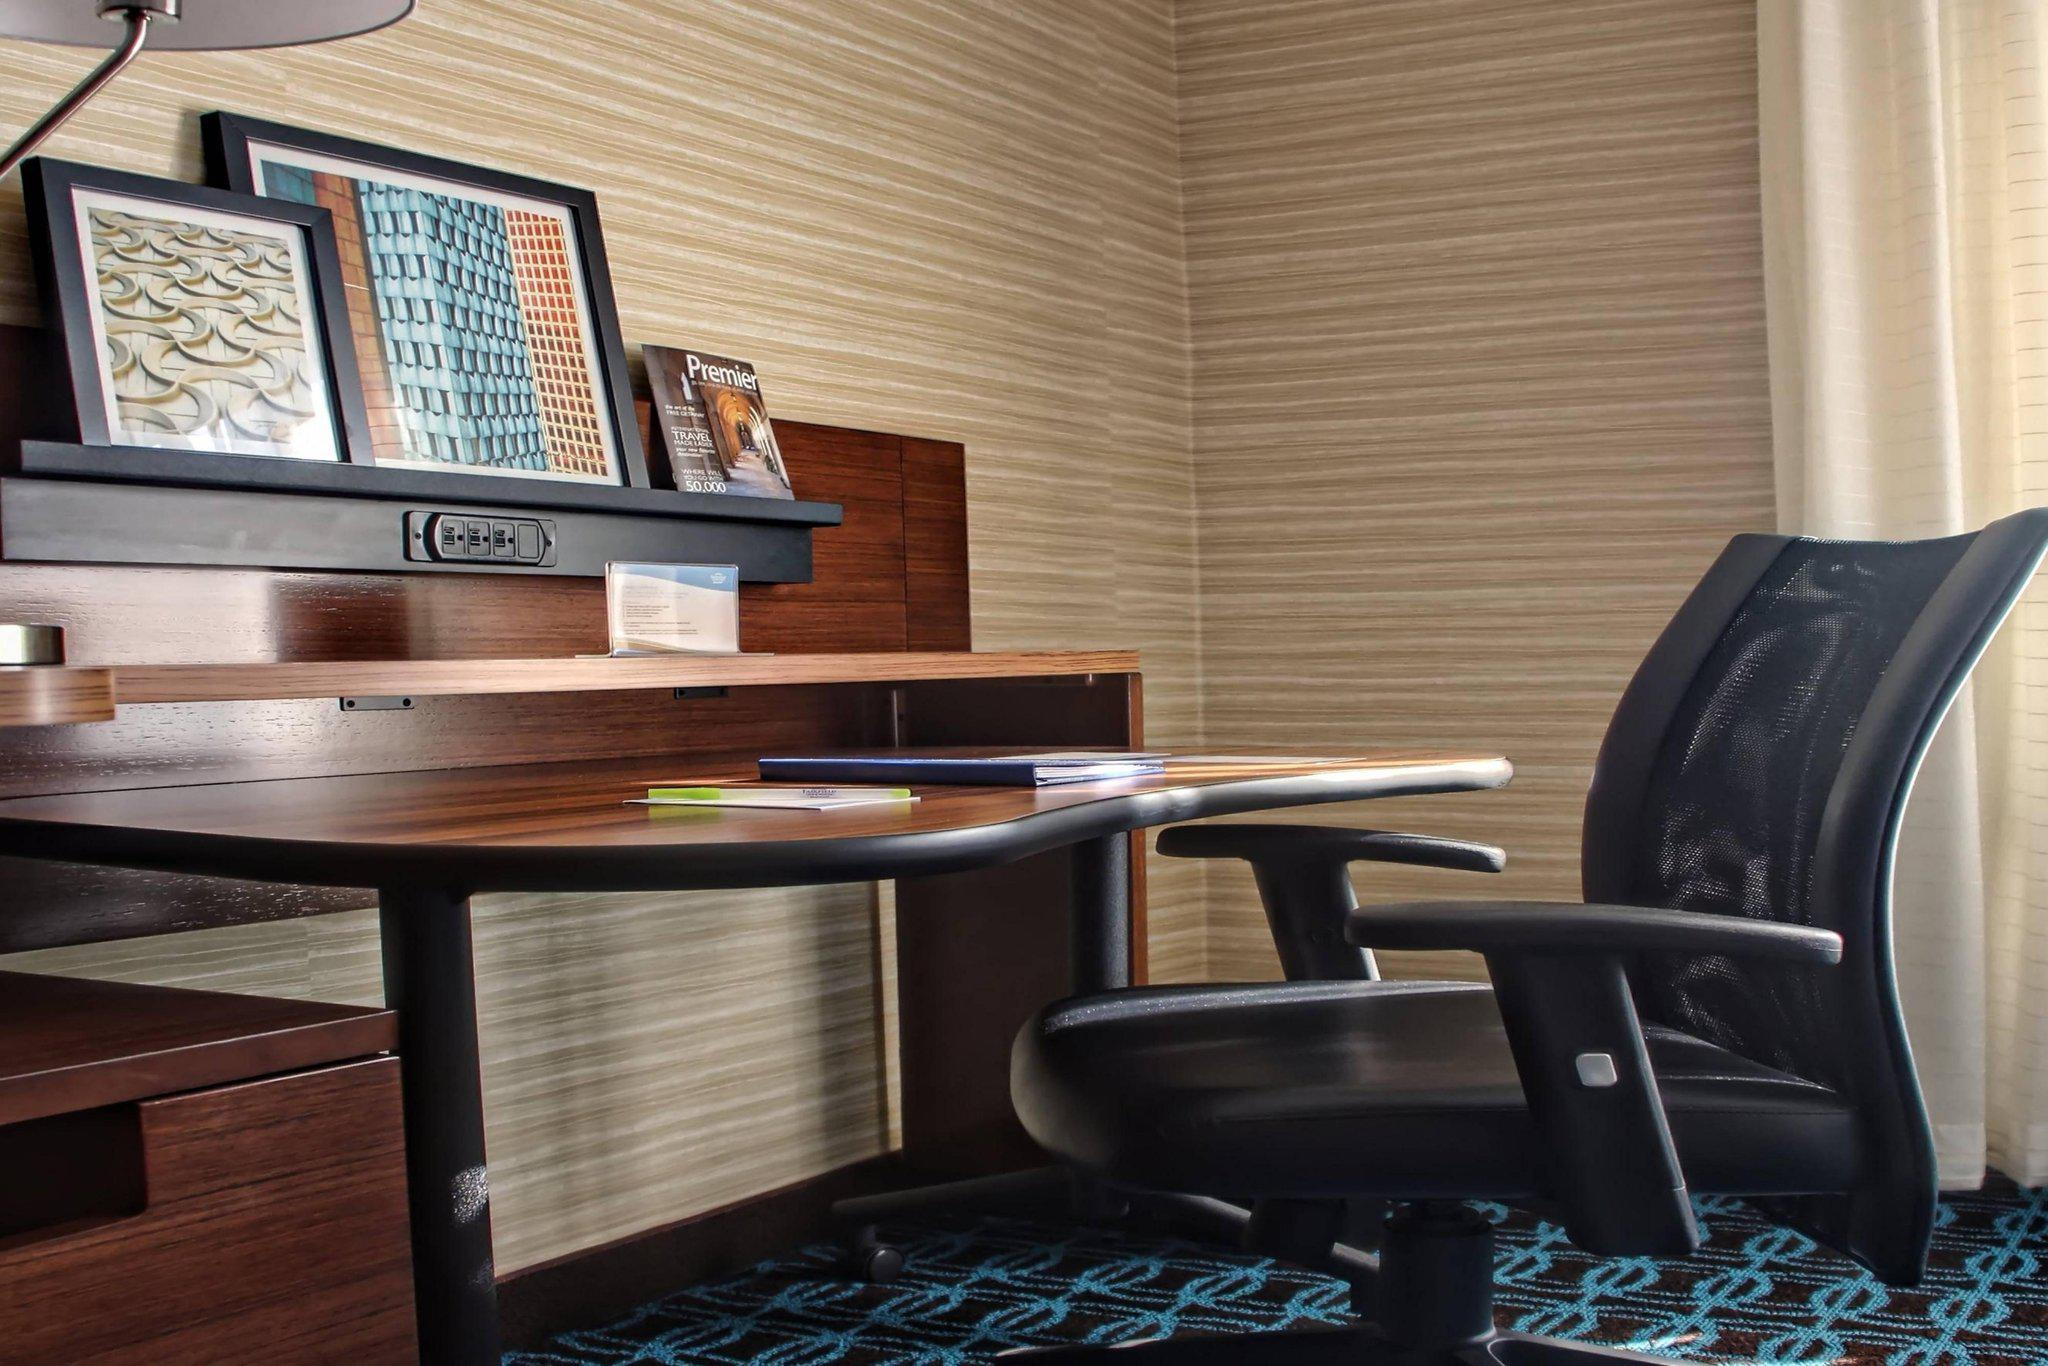 Fairfield Inn & Suites by Marriott Reading Wyomissing